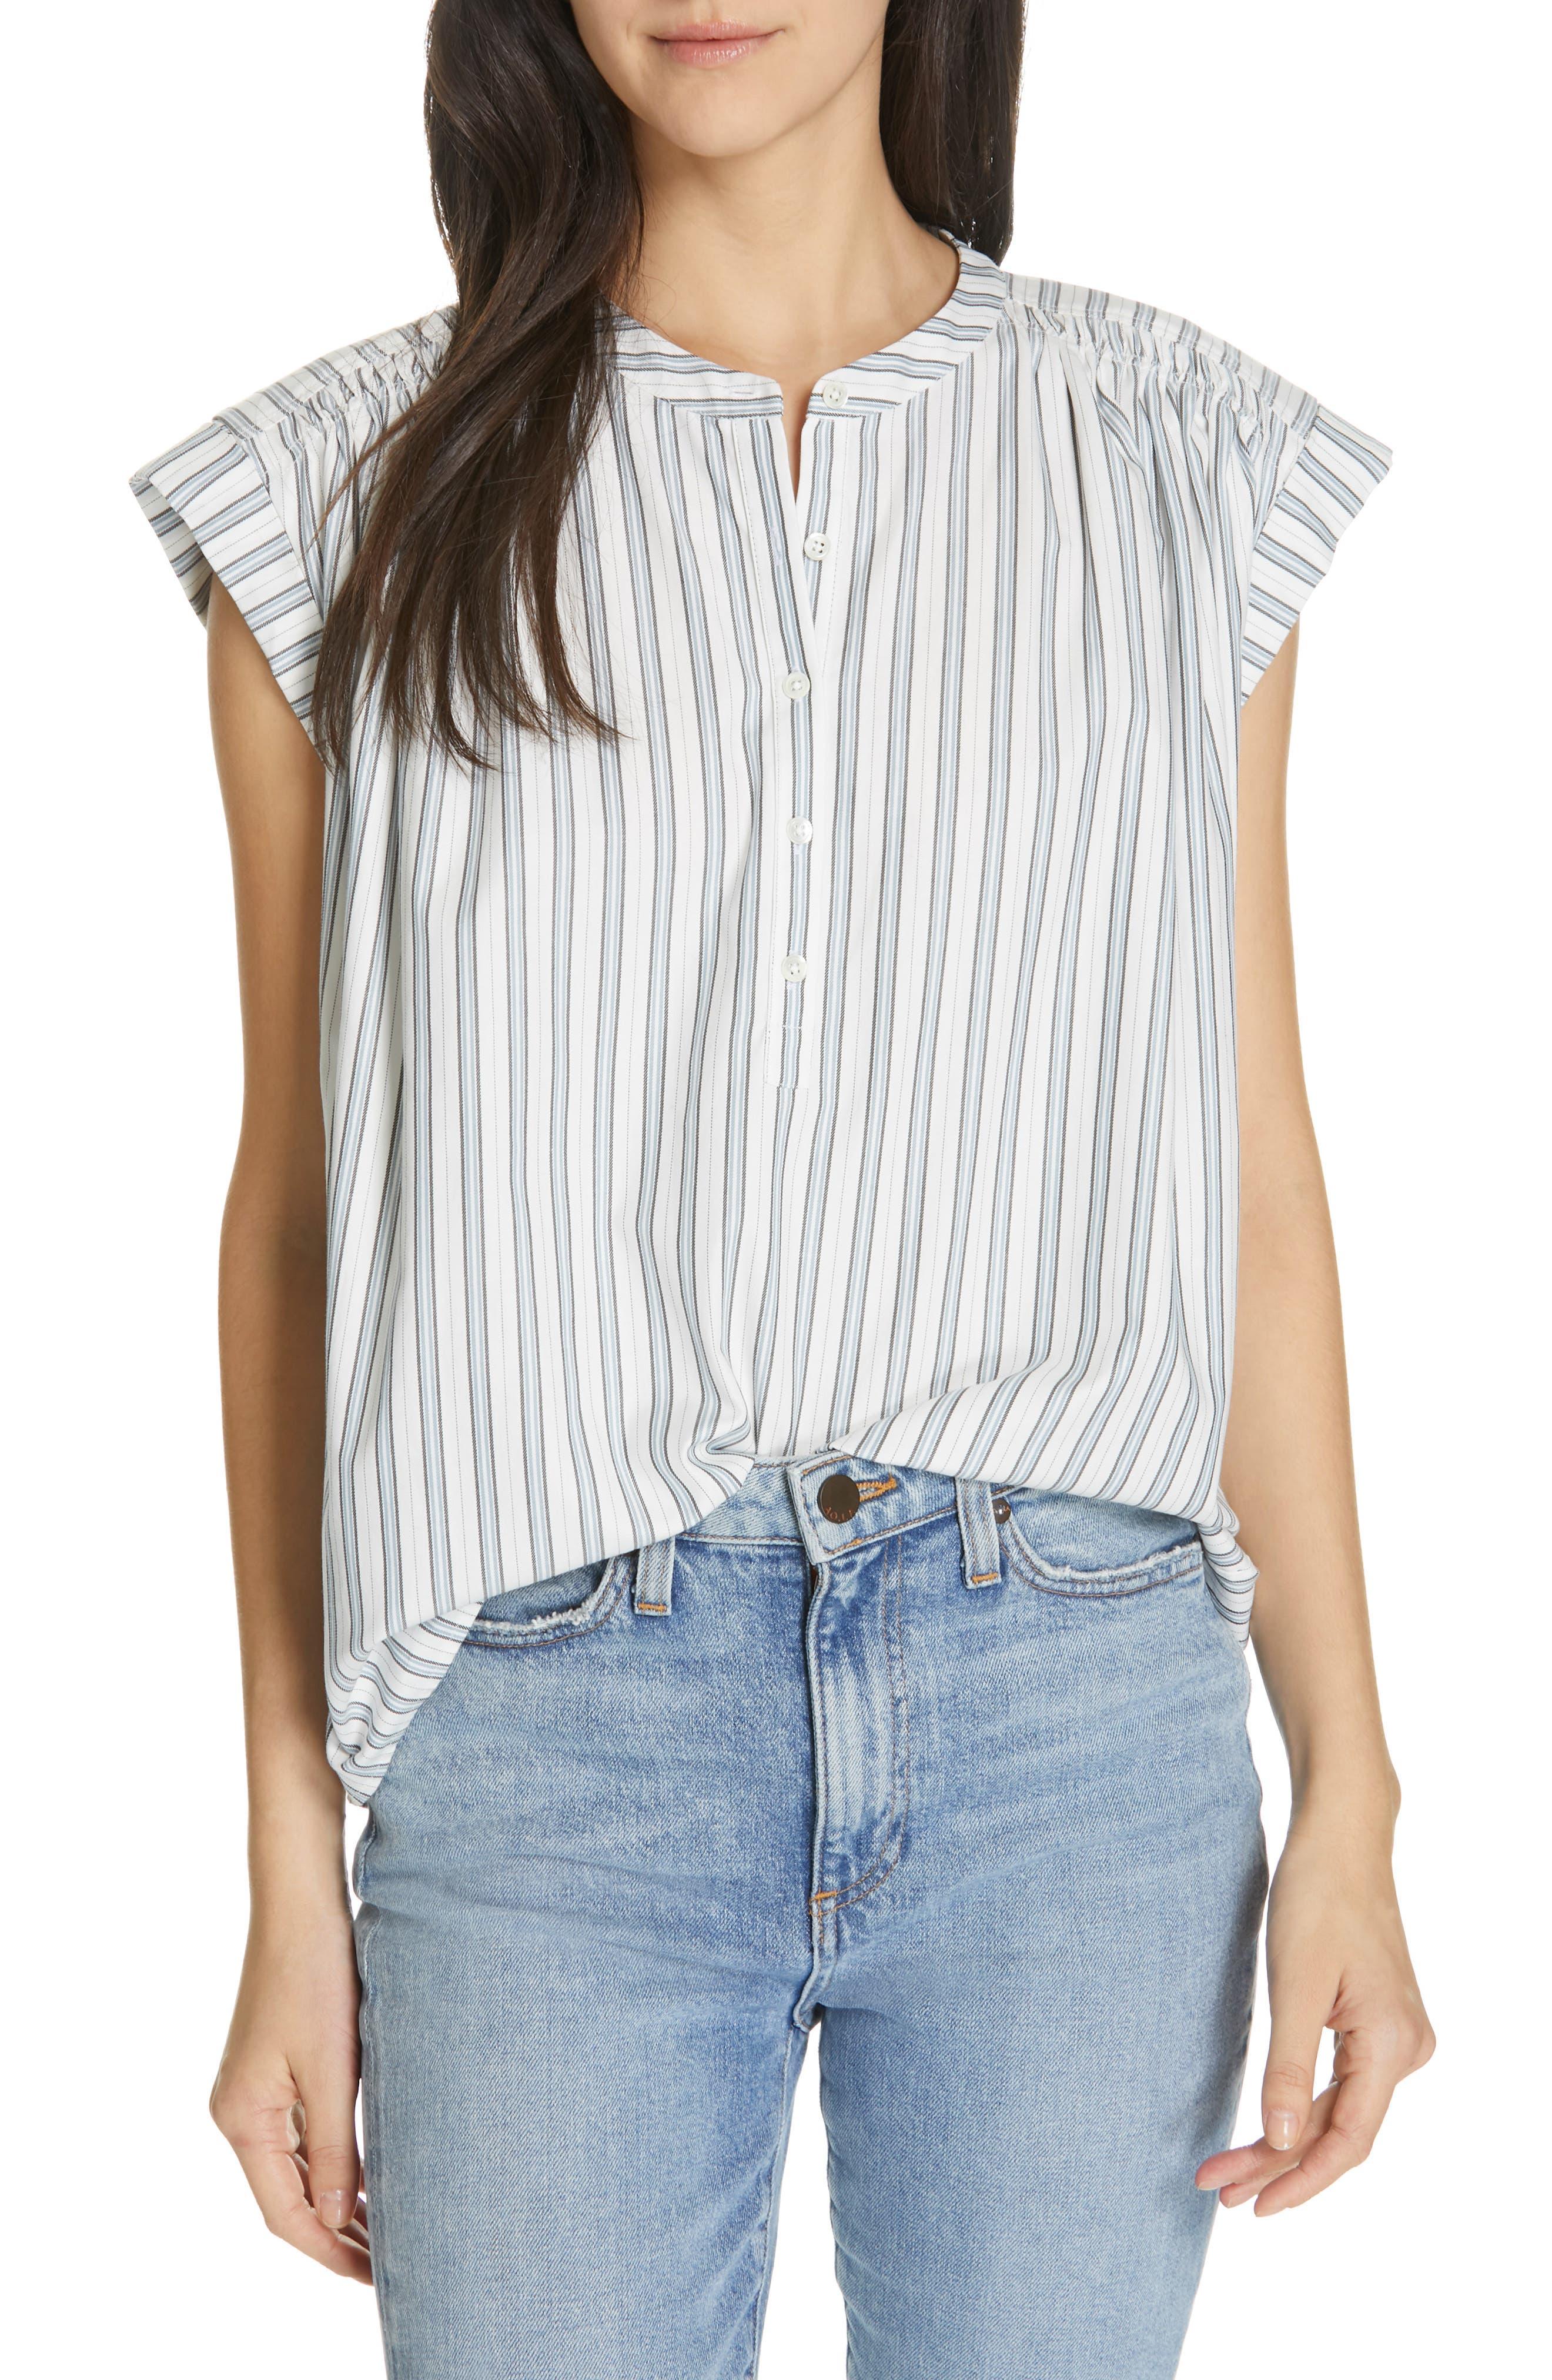 Jacquita Stripe Top, Main, color, 100